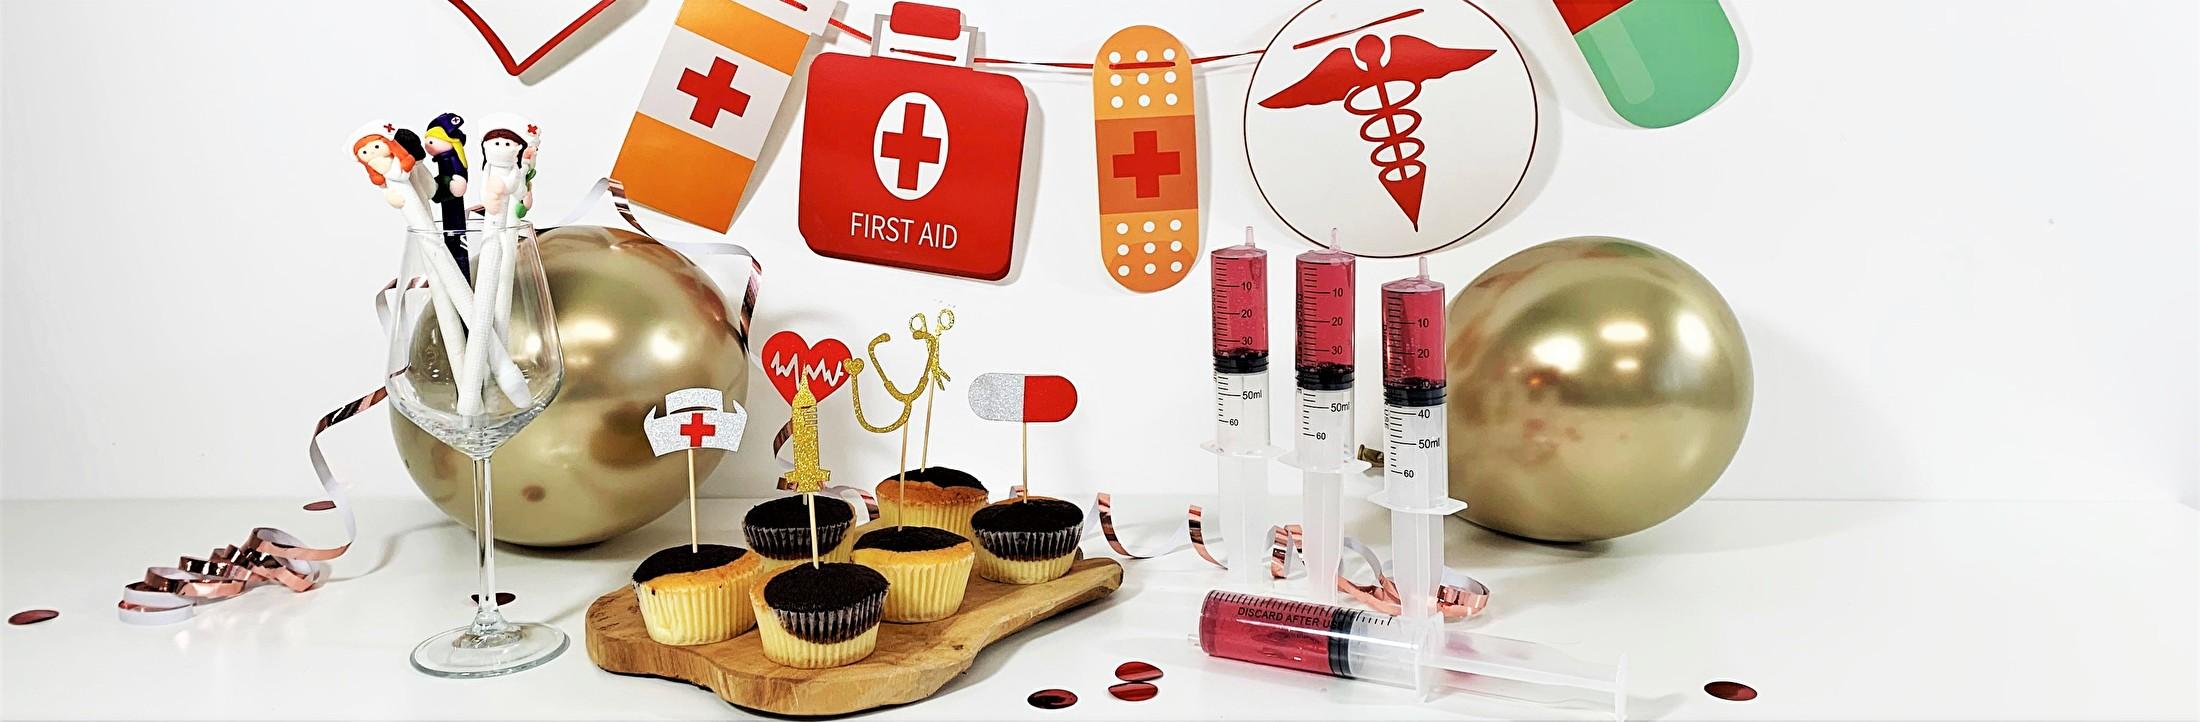 geslaagd-verpleegkundige-arts-diploma-feest